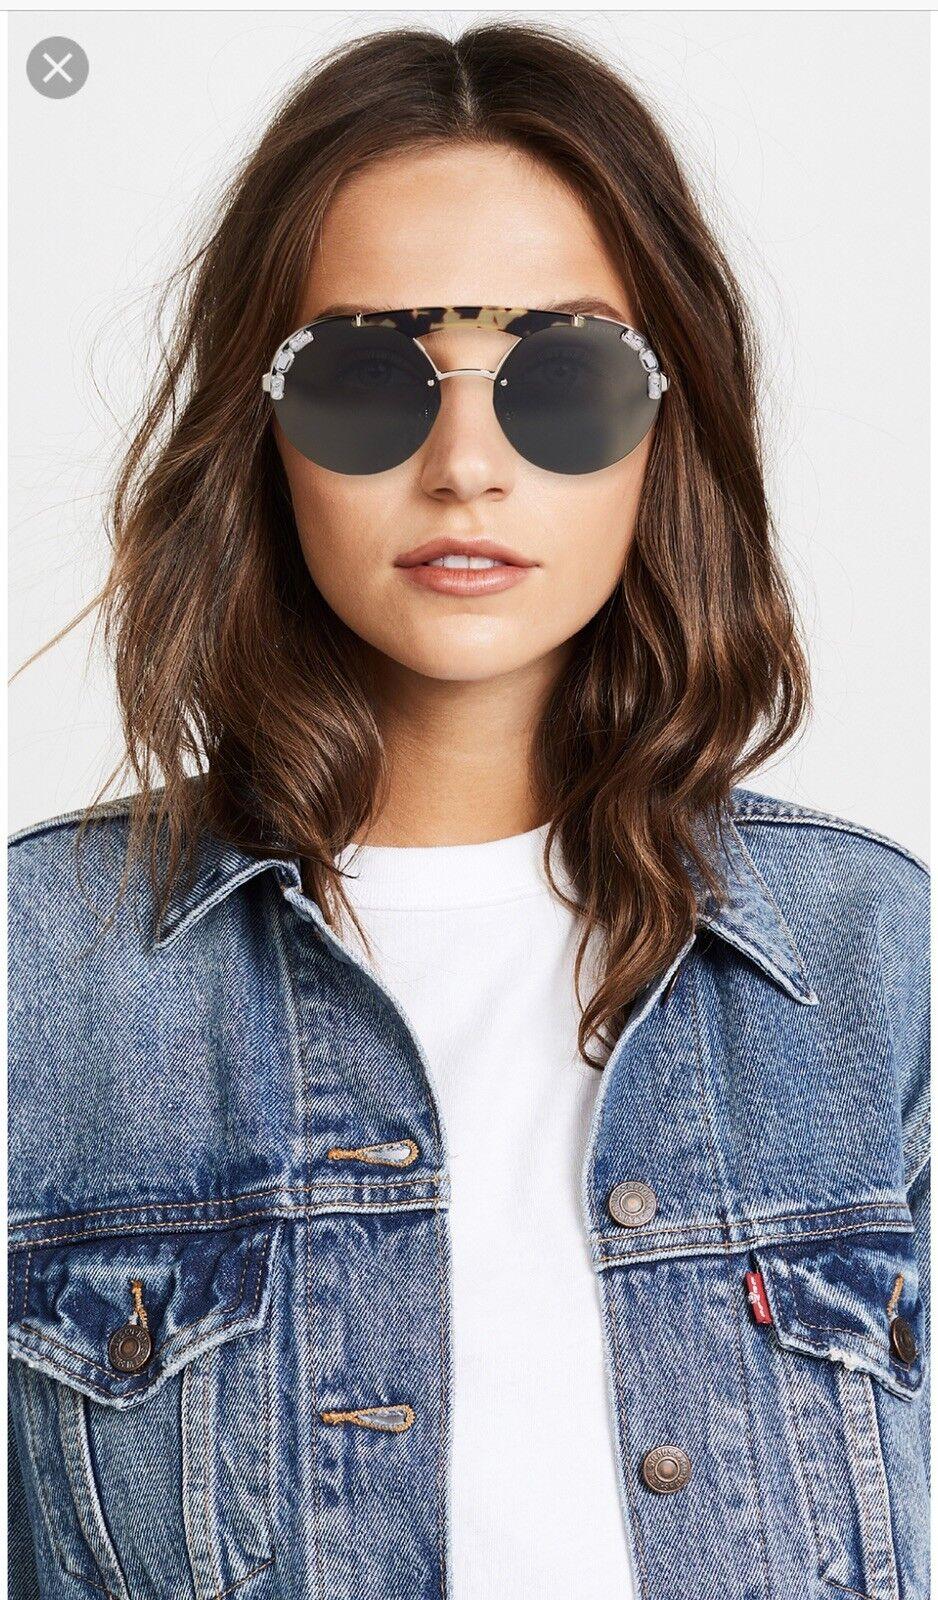 100% Authentic PRADA ORNATE ROUND Brow Pale Gold Havana/Grey sunglasses